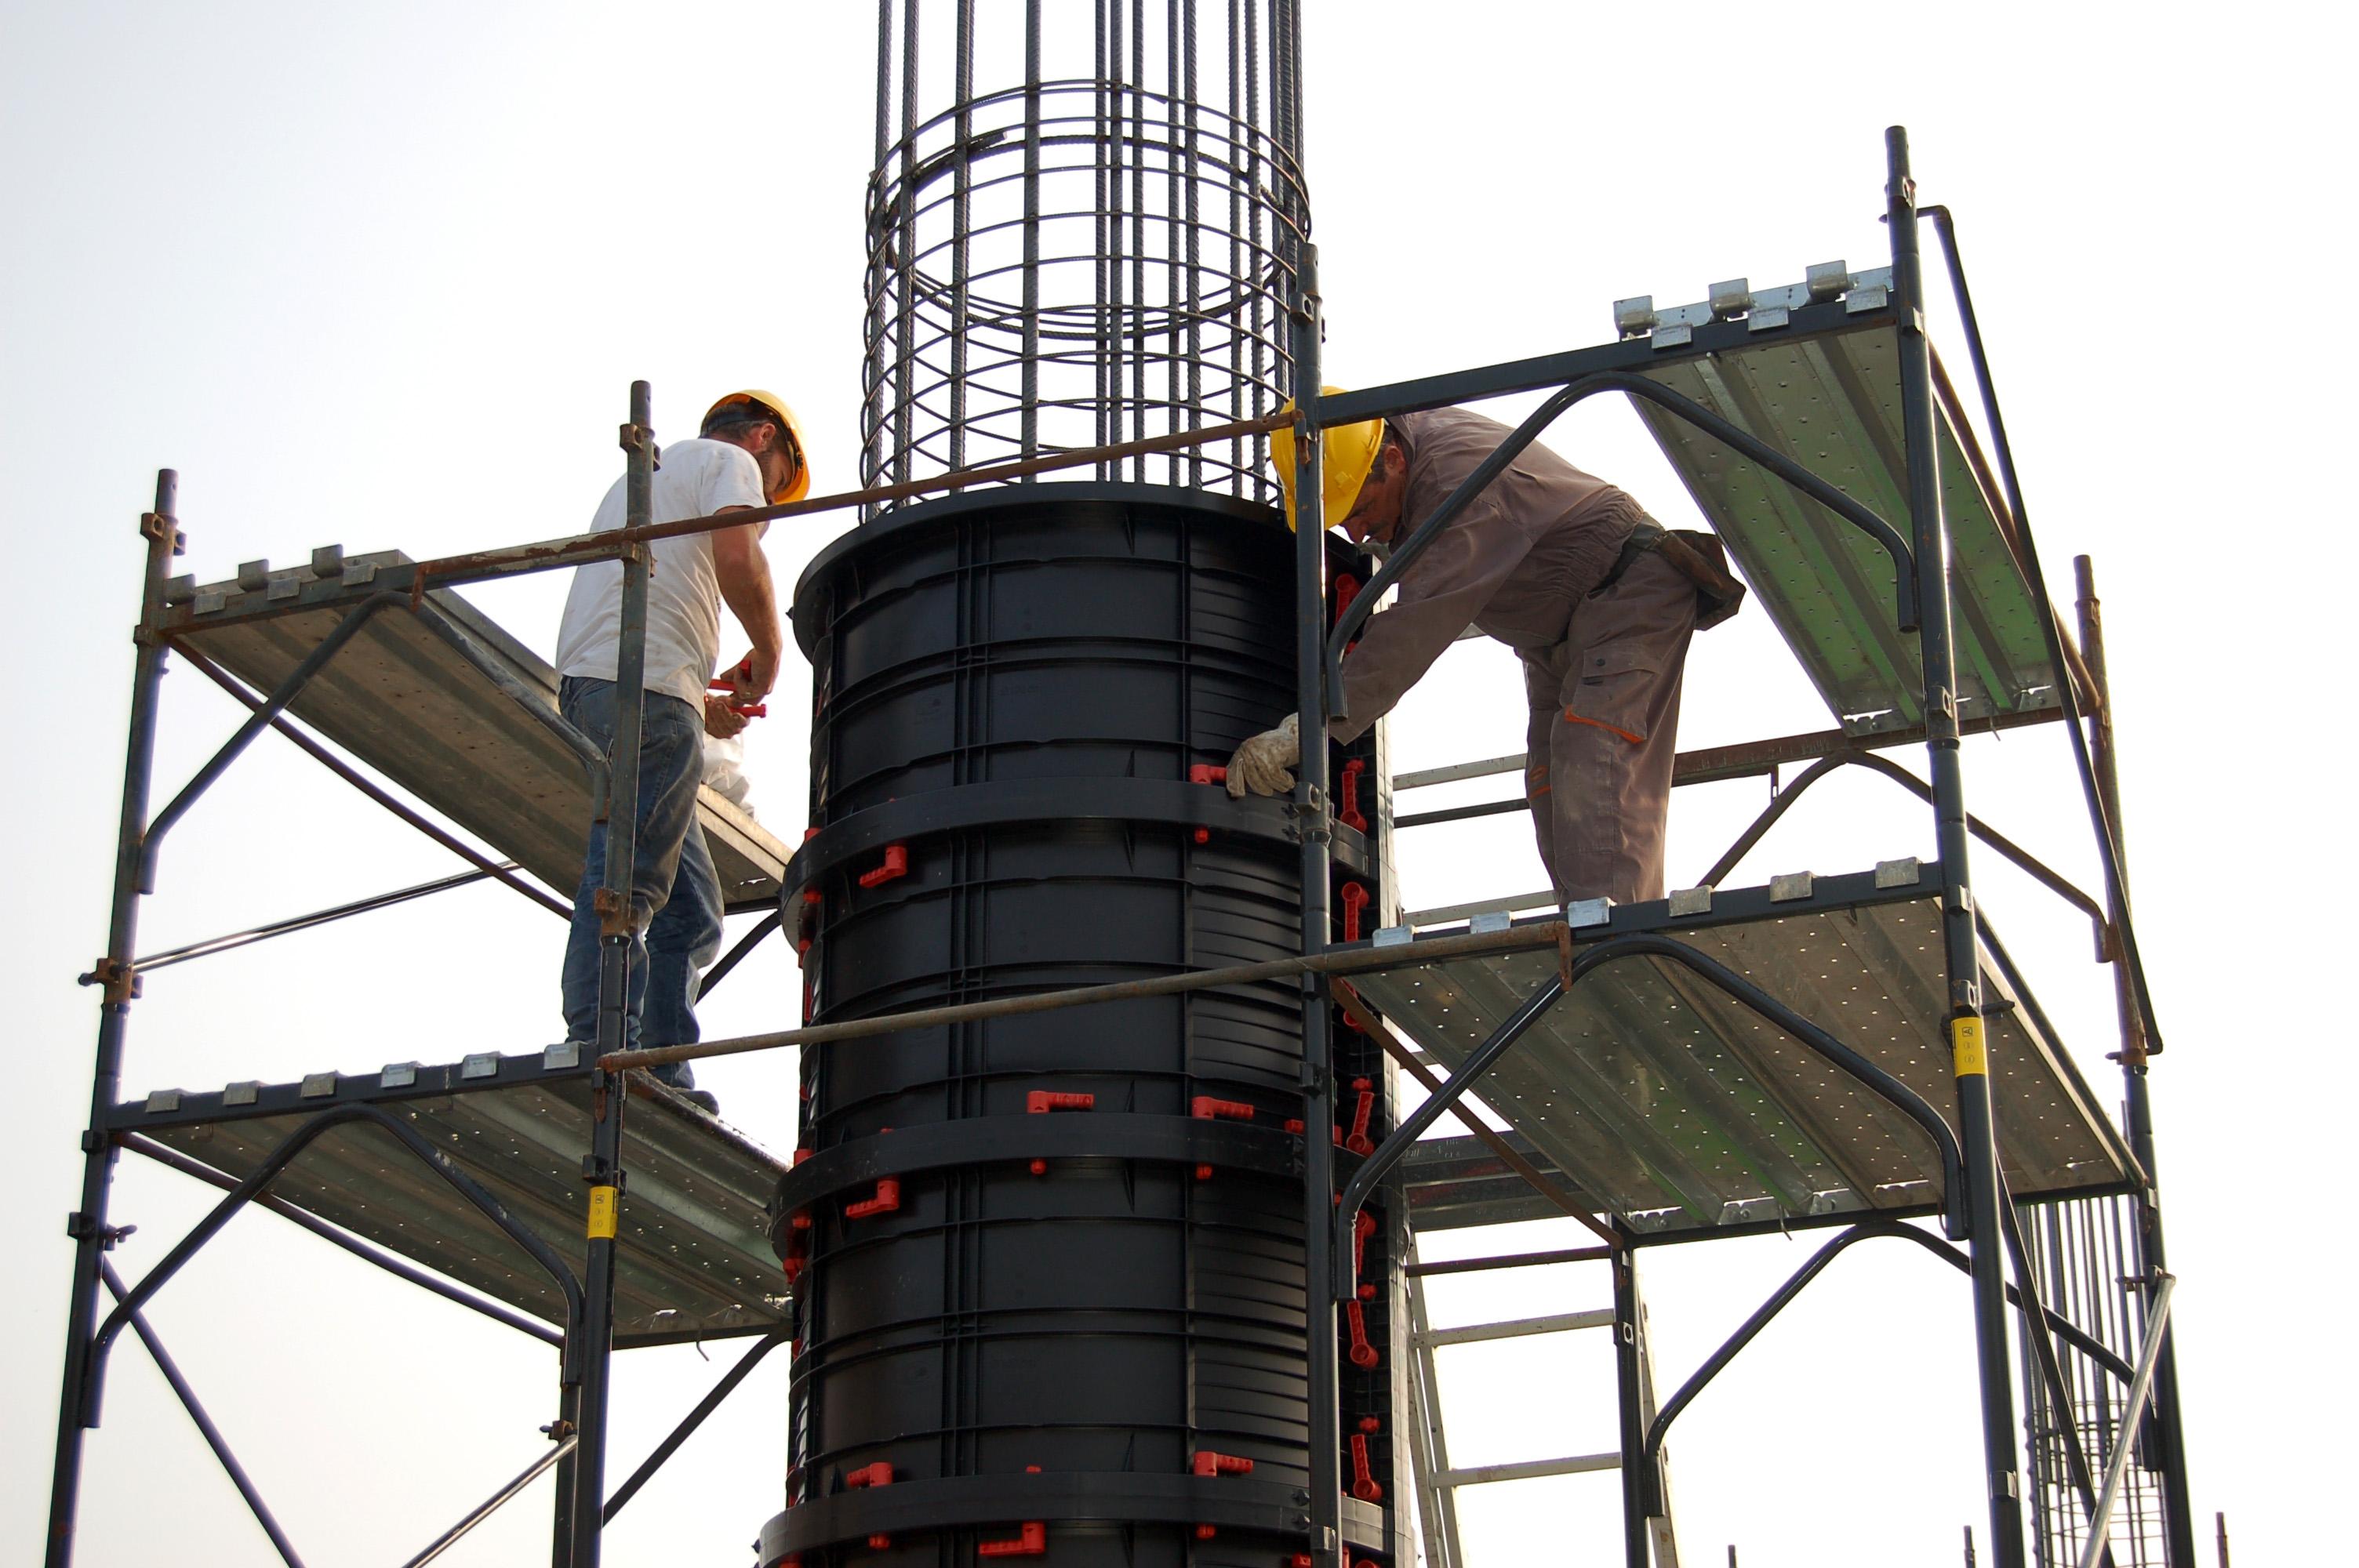 Cofraje refolosibile pentru coloane cilindrice GEOPLAST - Poza 2